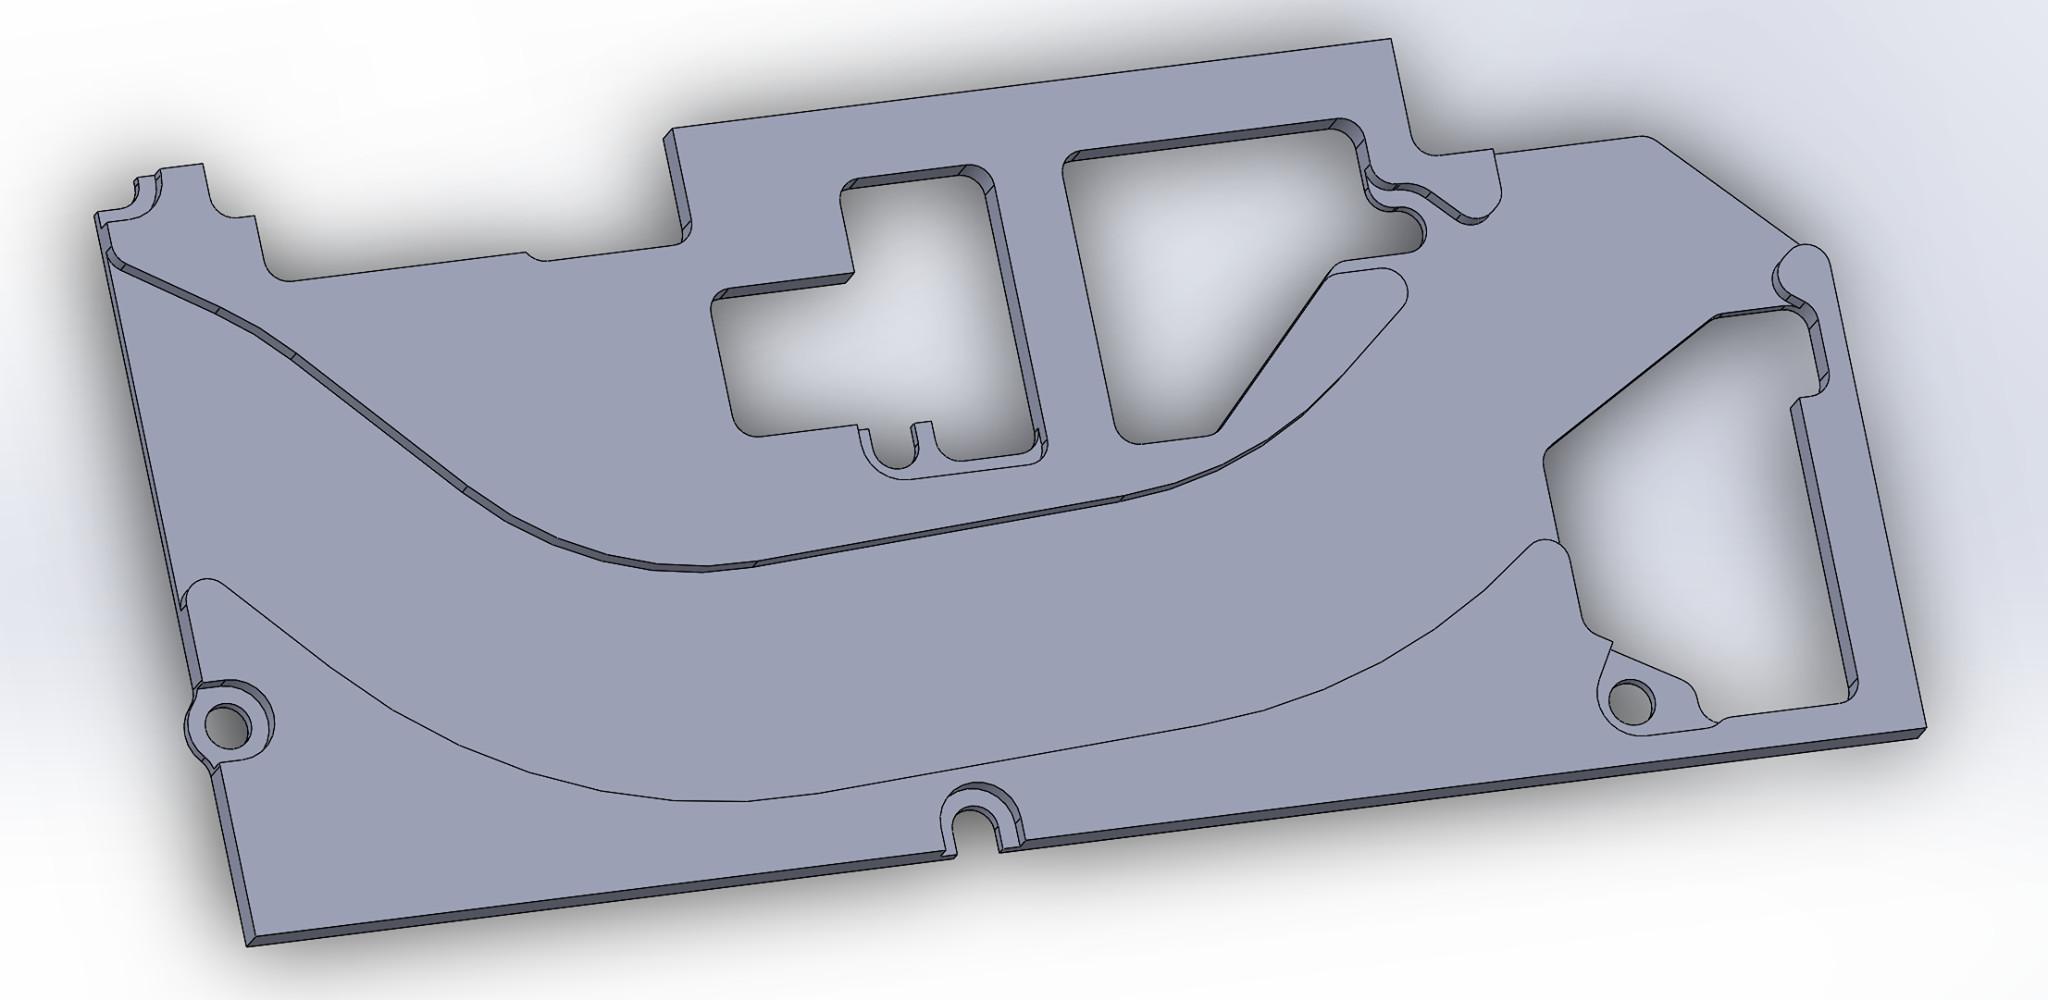 Project] Make the XPS 15 less on fire (Custom Heatsink Mod) - DIY